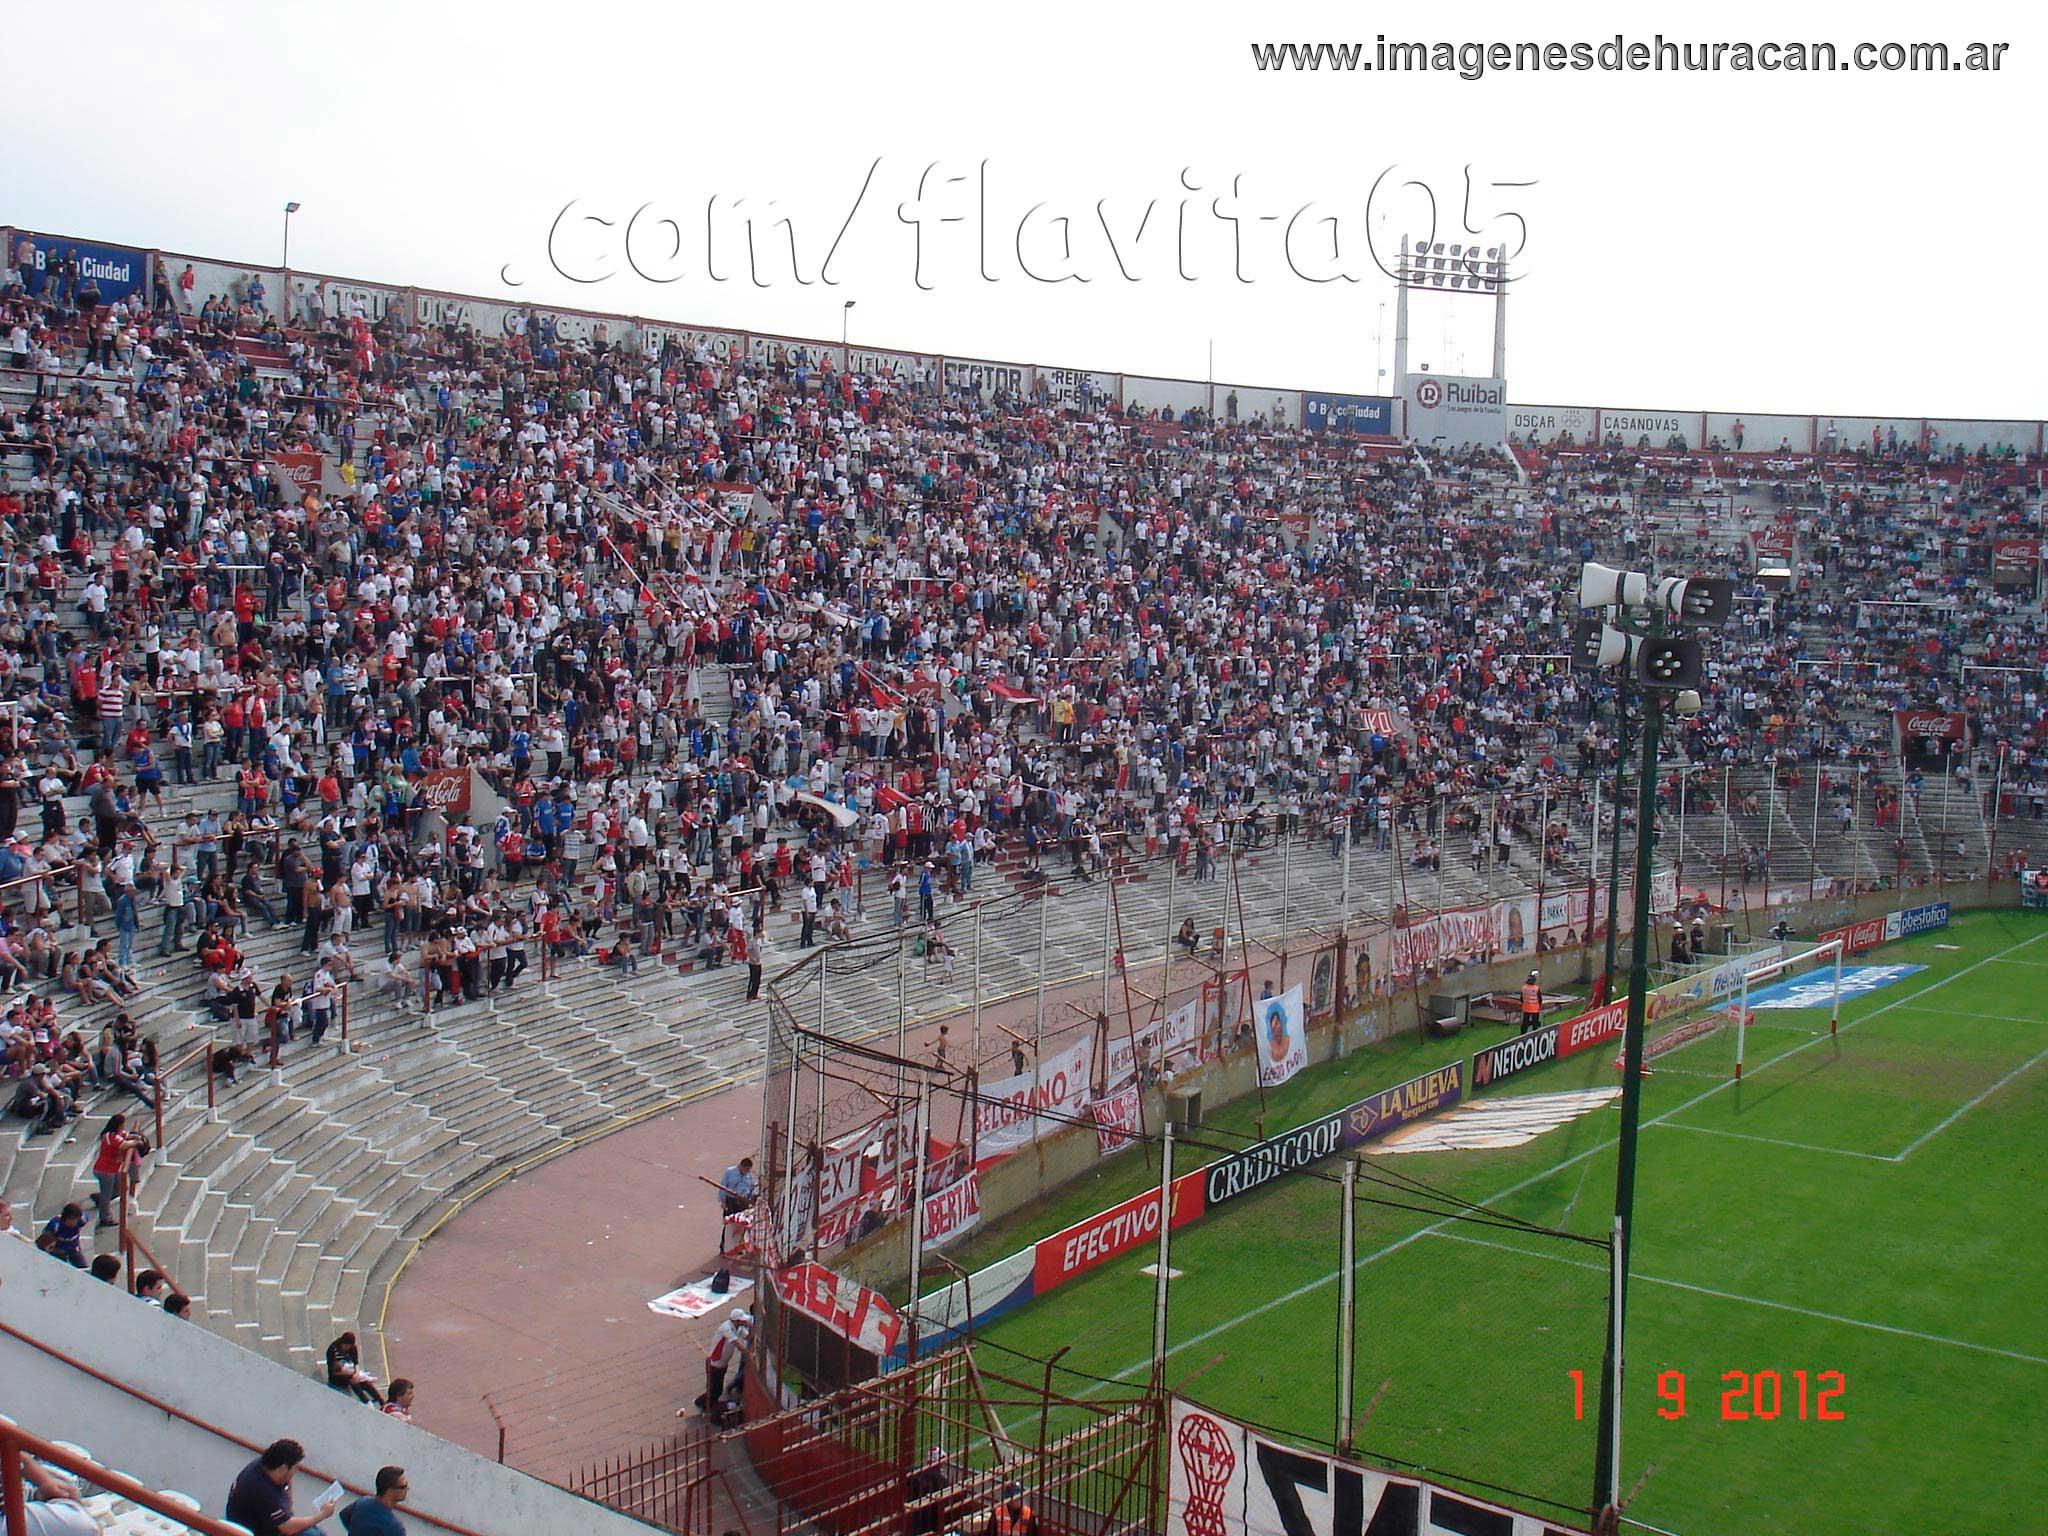 Huracán vs deportivo merlo fecha 04 nacional B 2012-2013